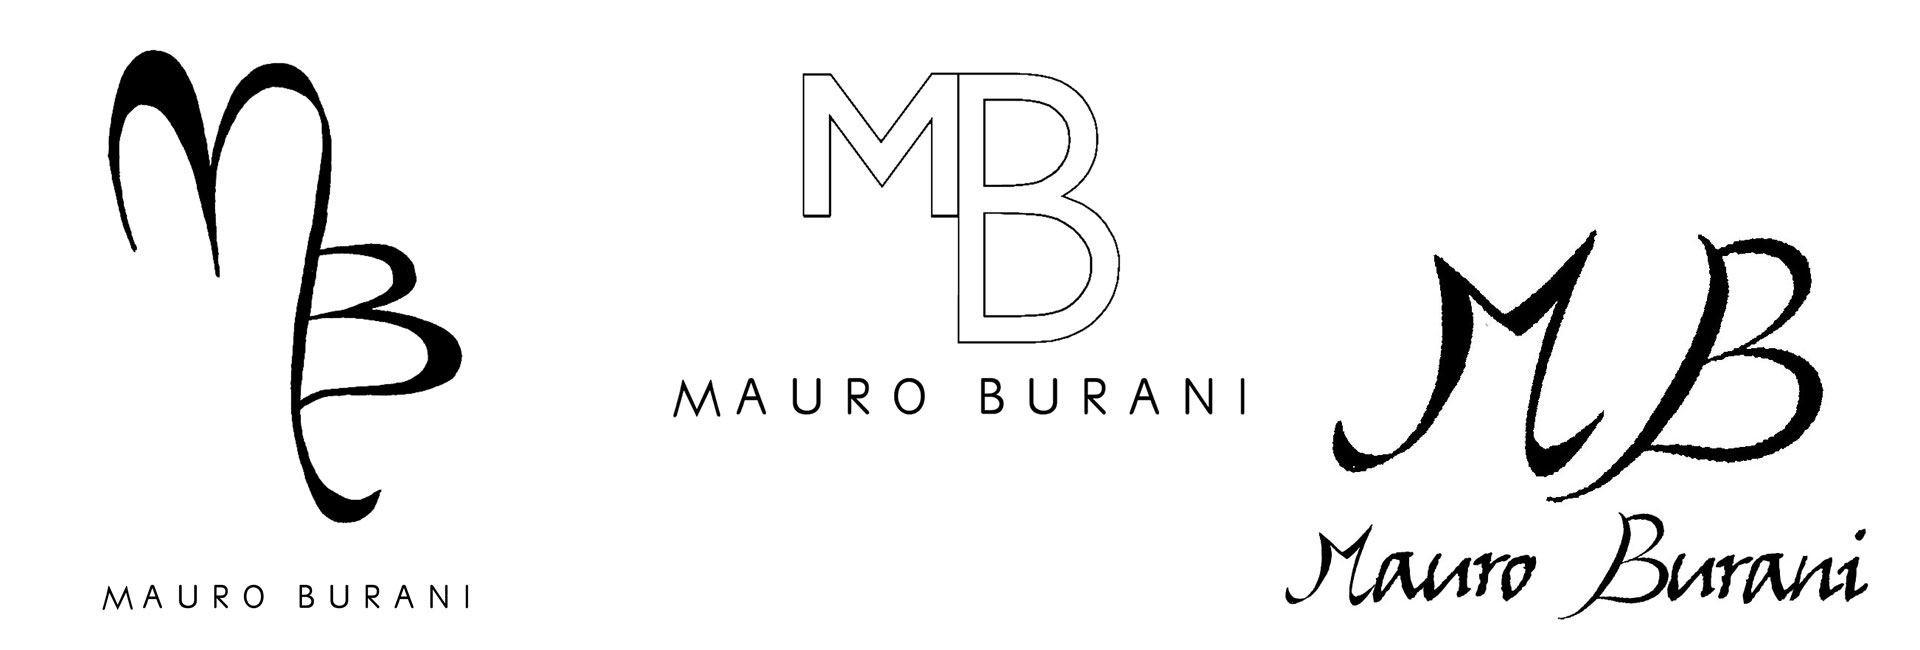 Copertina di Mauro Burani